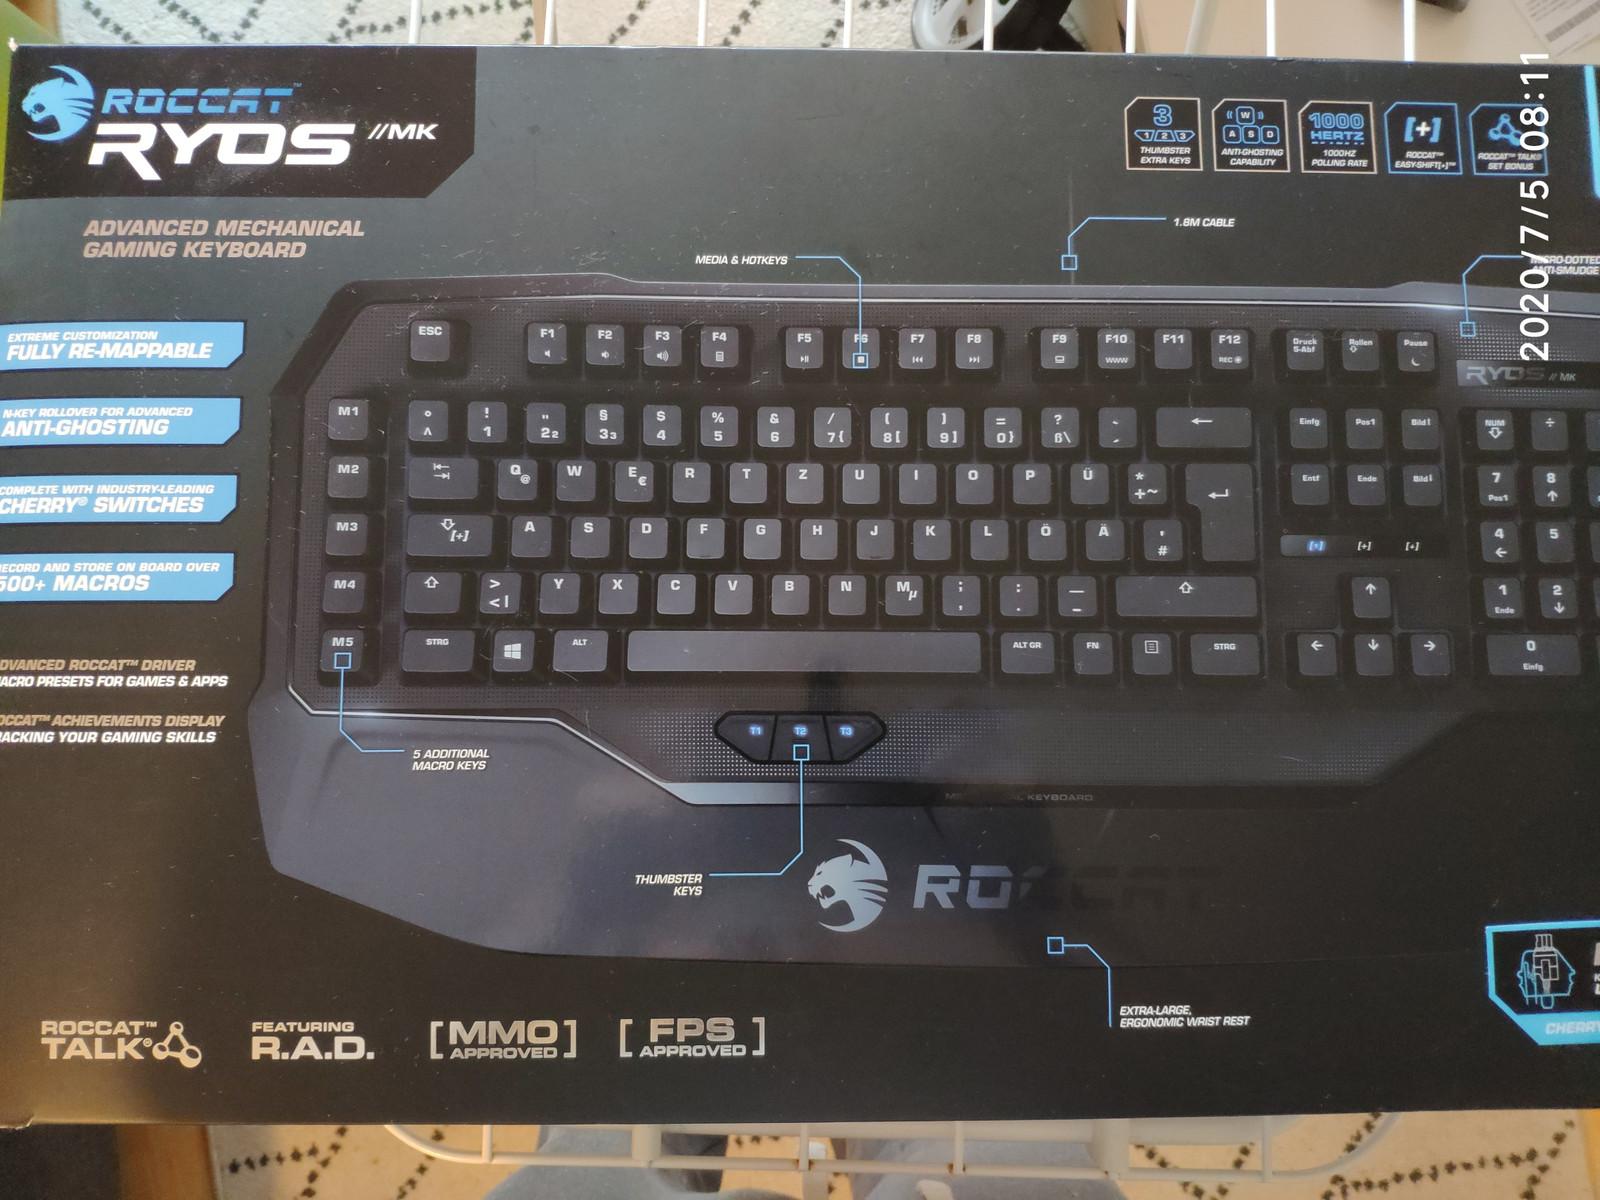 Roccat RYOS MK keyboardtastatur | FINN.no